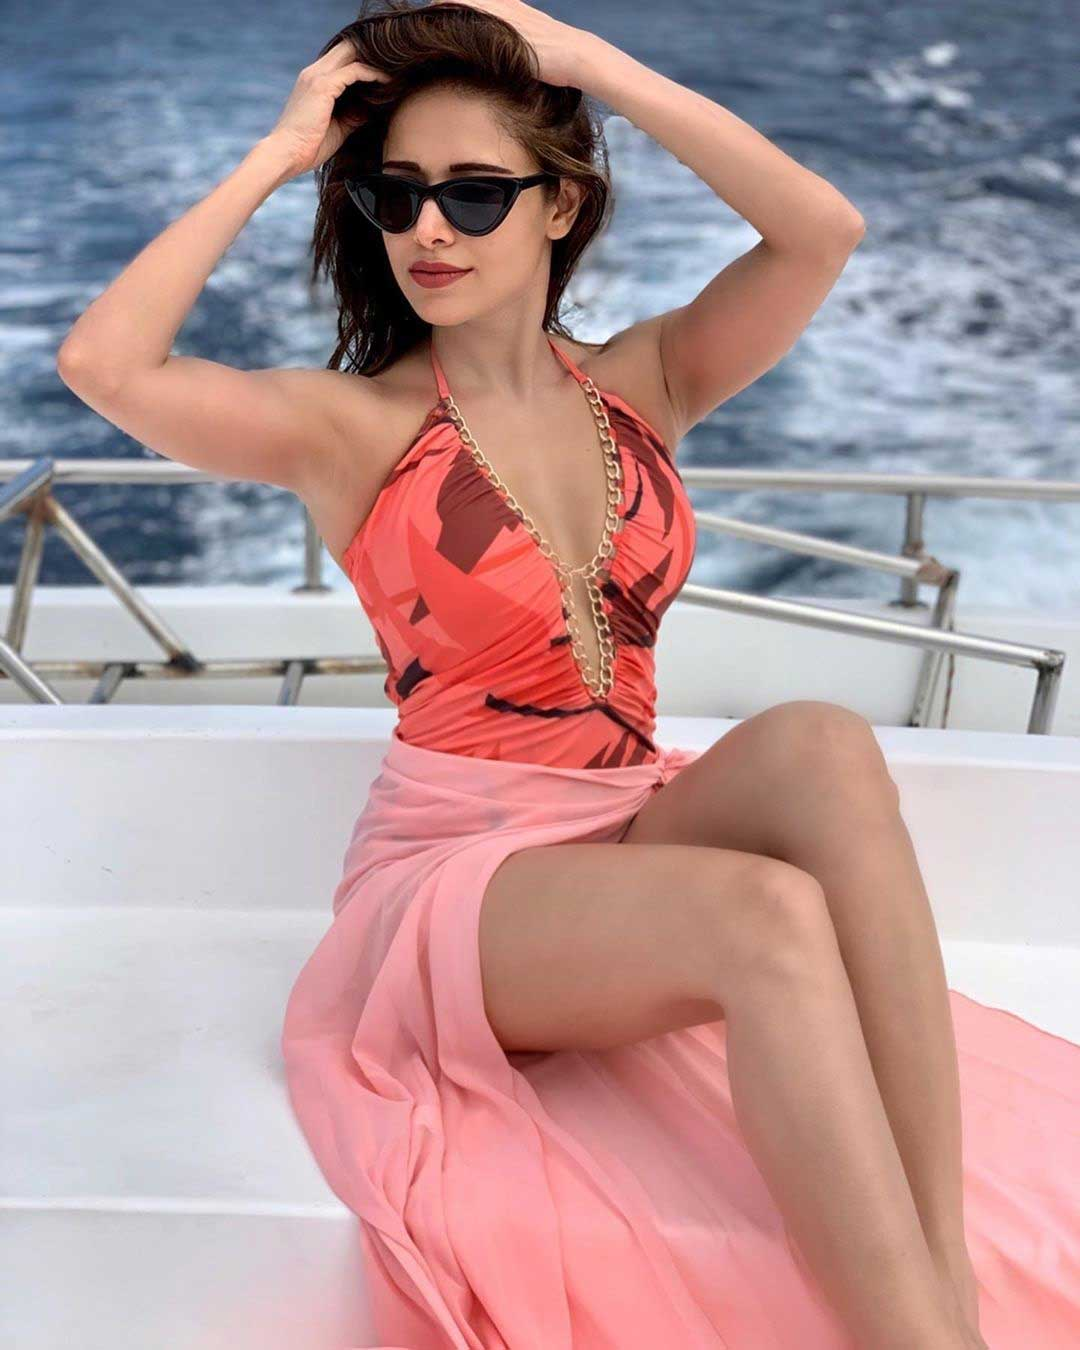 Nushrat Bharucha Hot and Sexy, Nushrat Bharucha Swimsuit